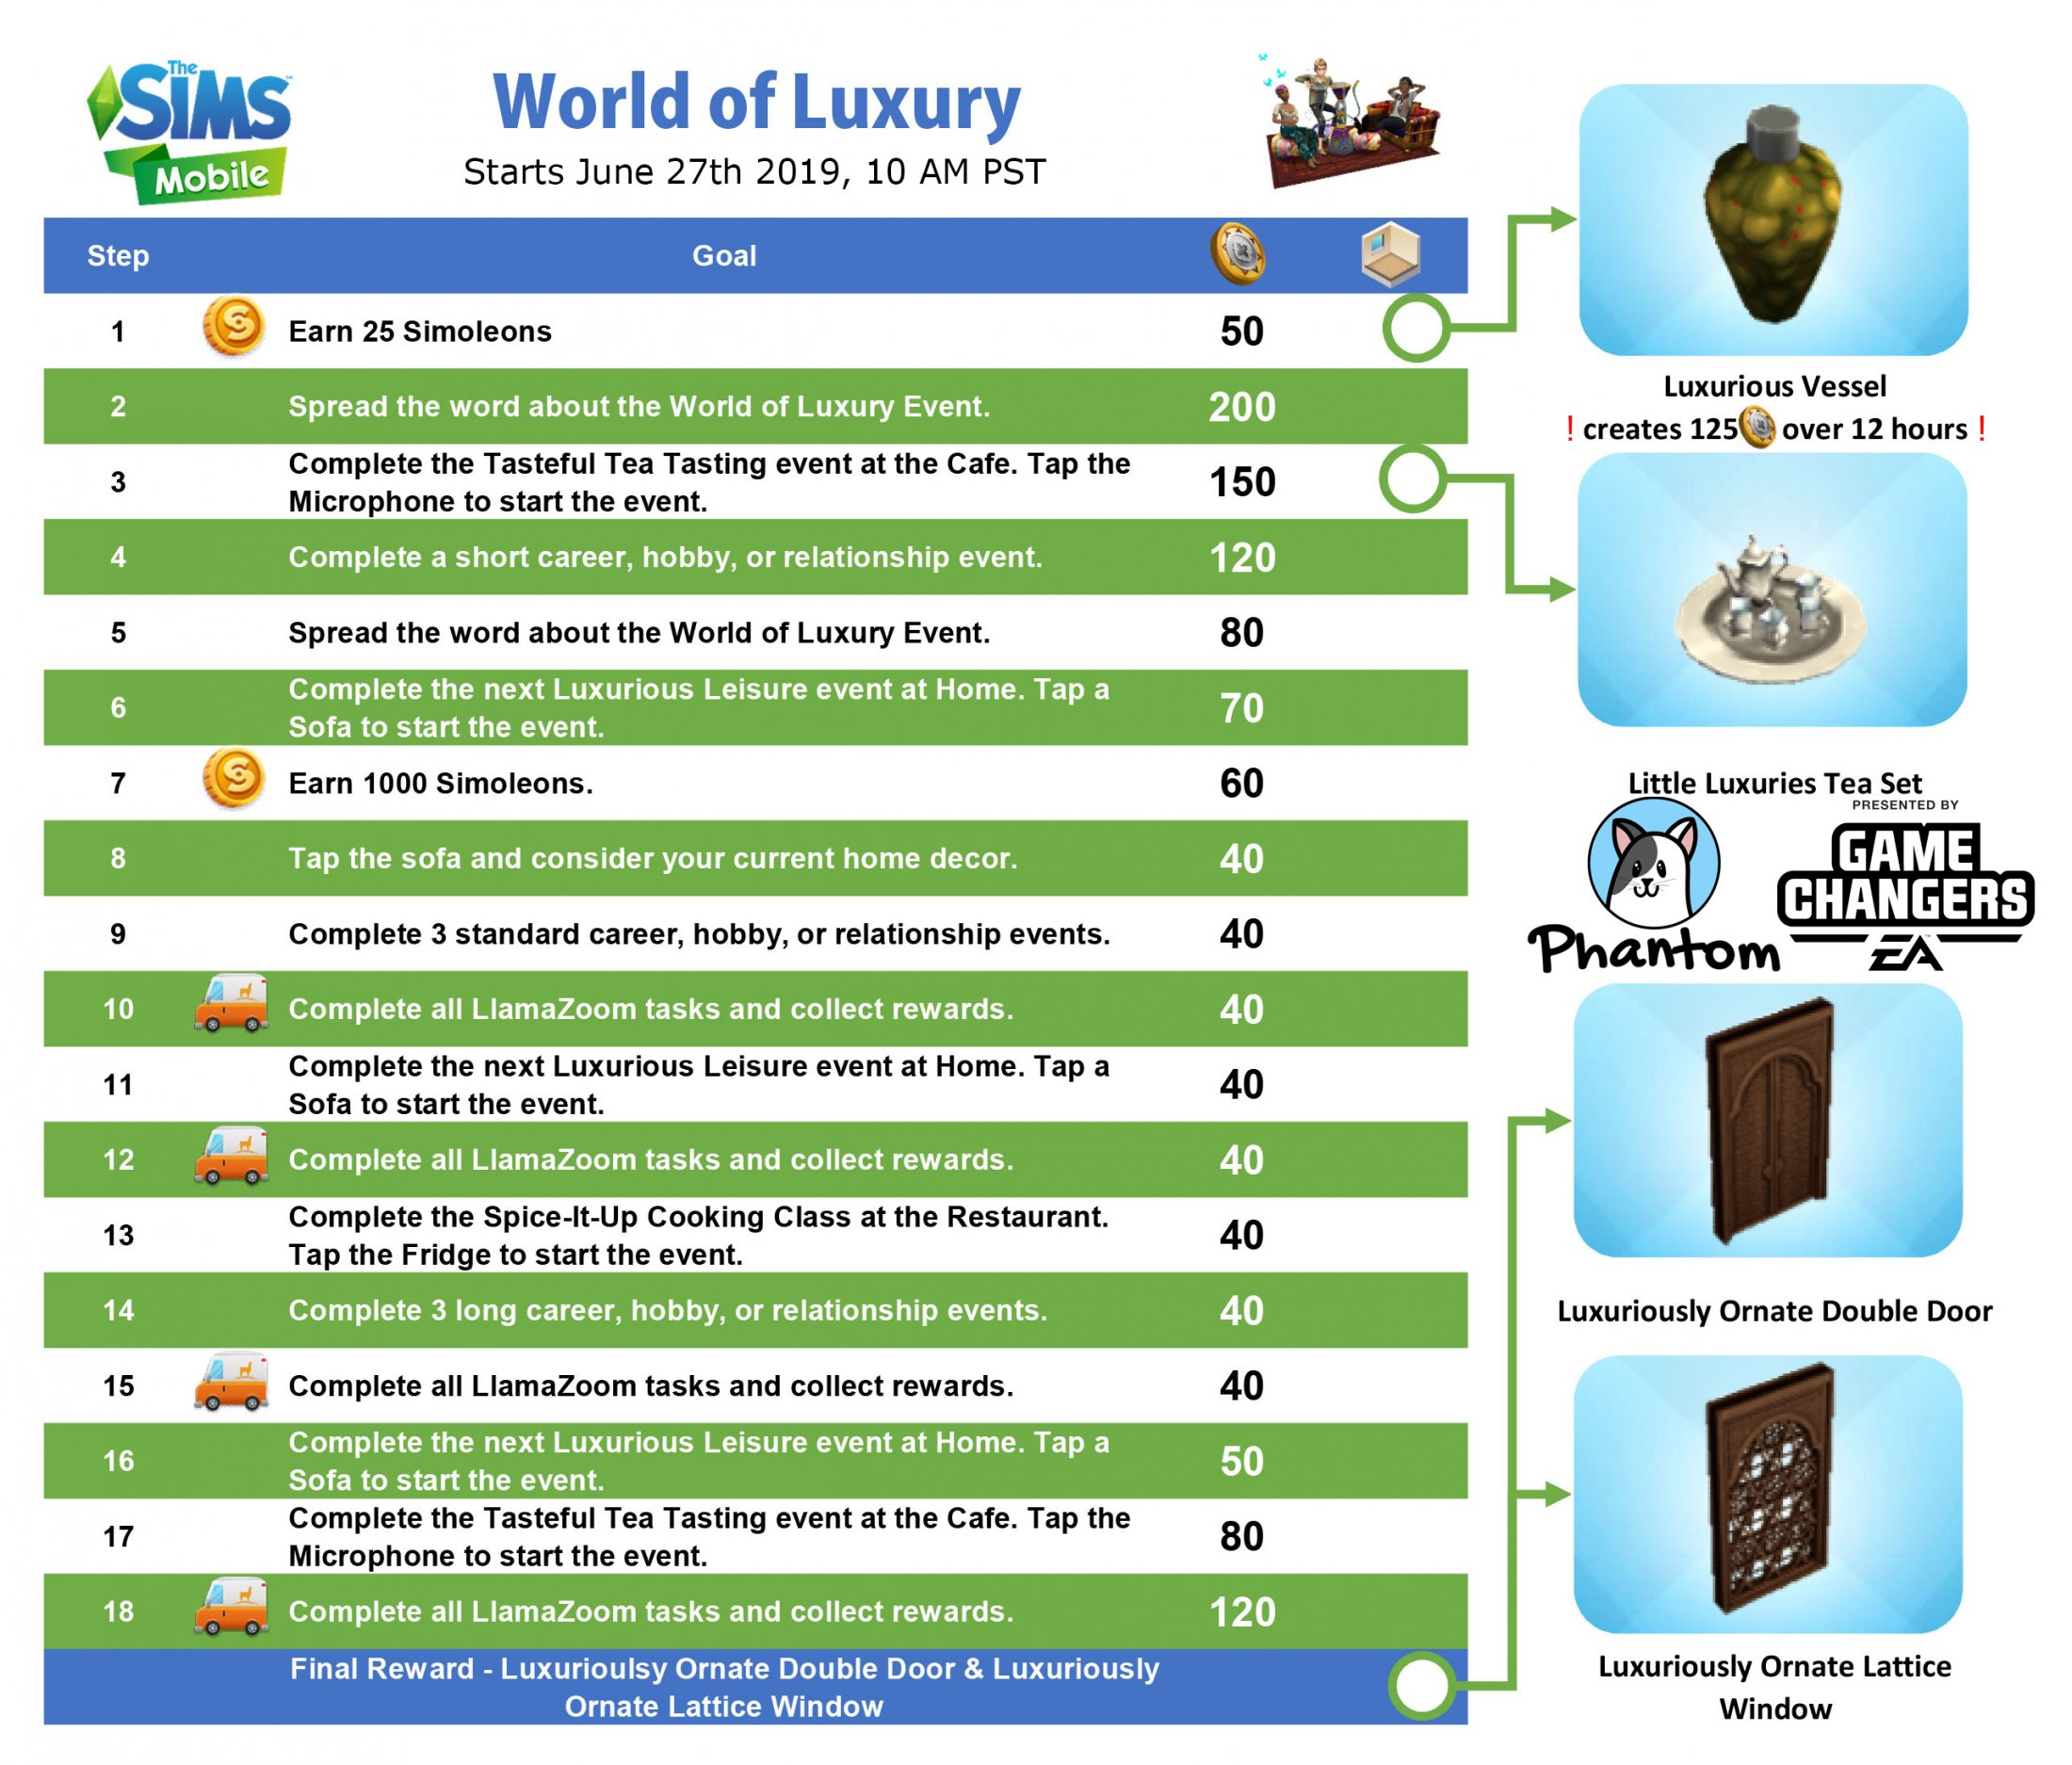 World of Luxury